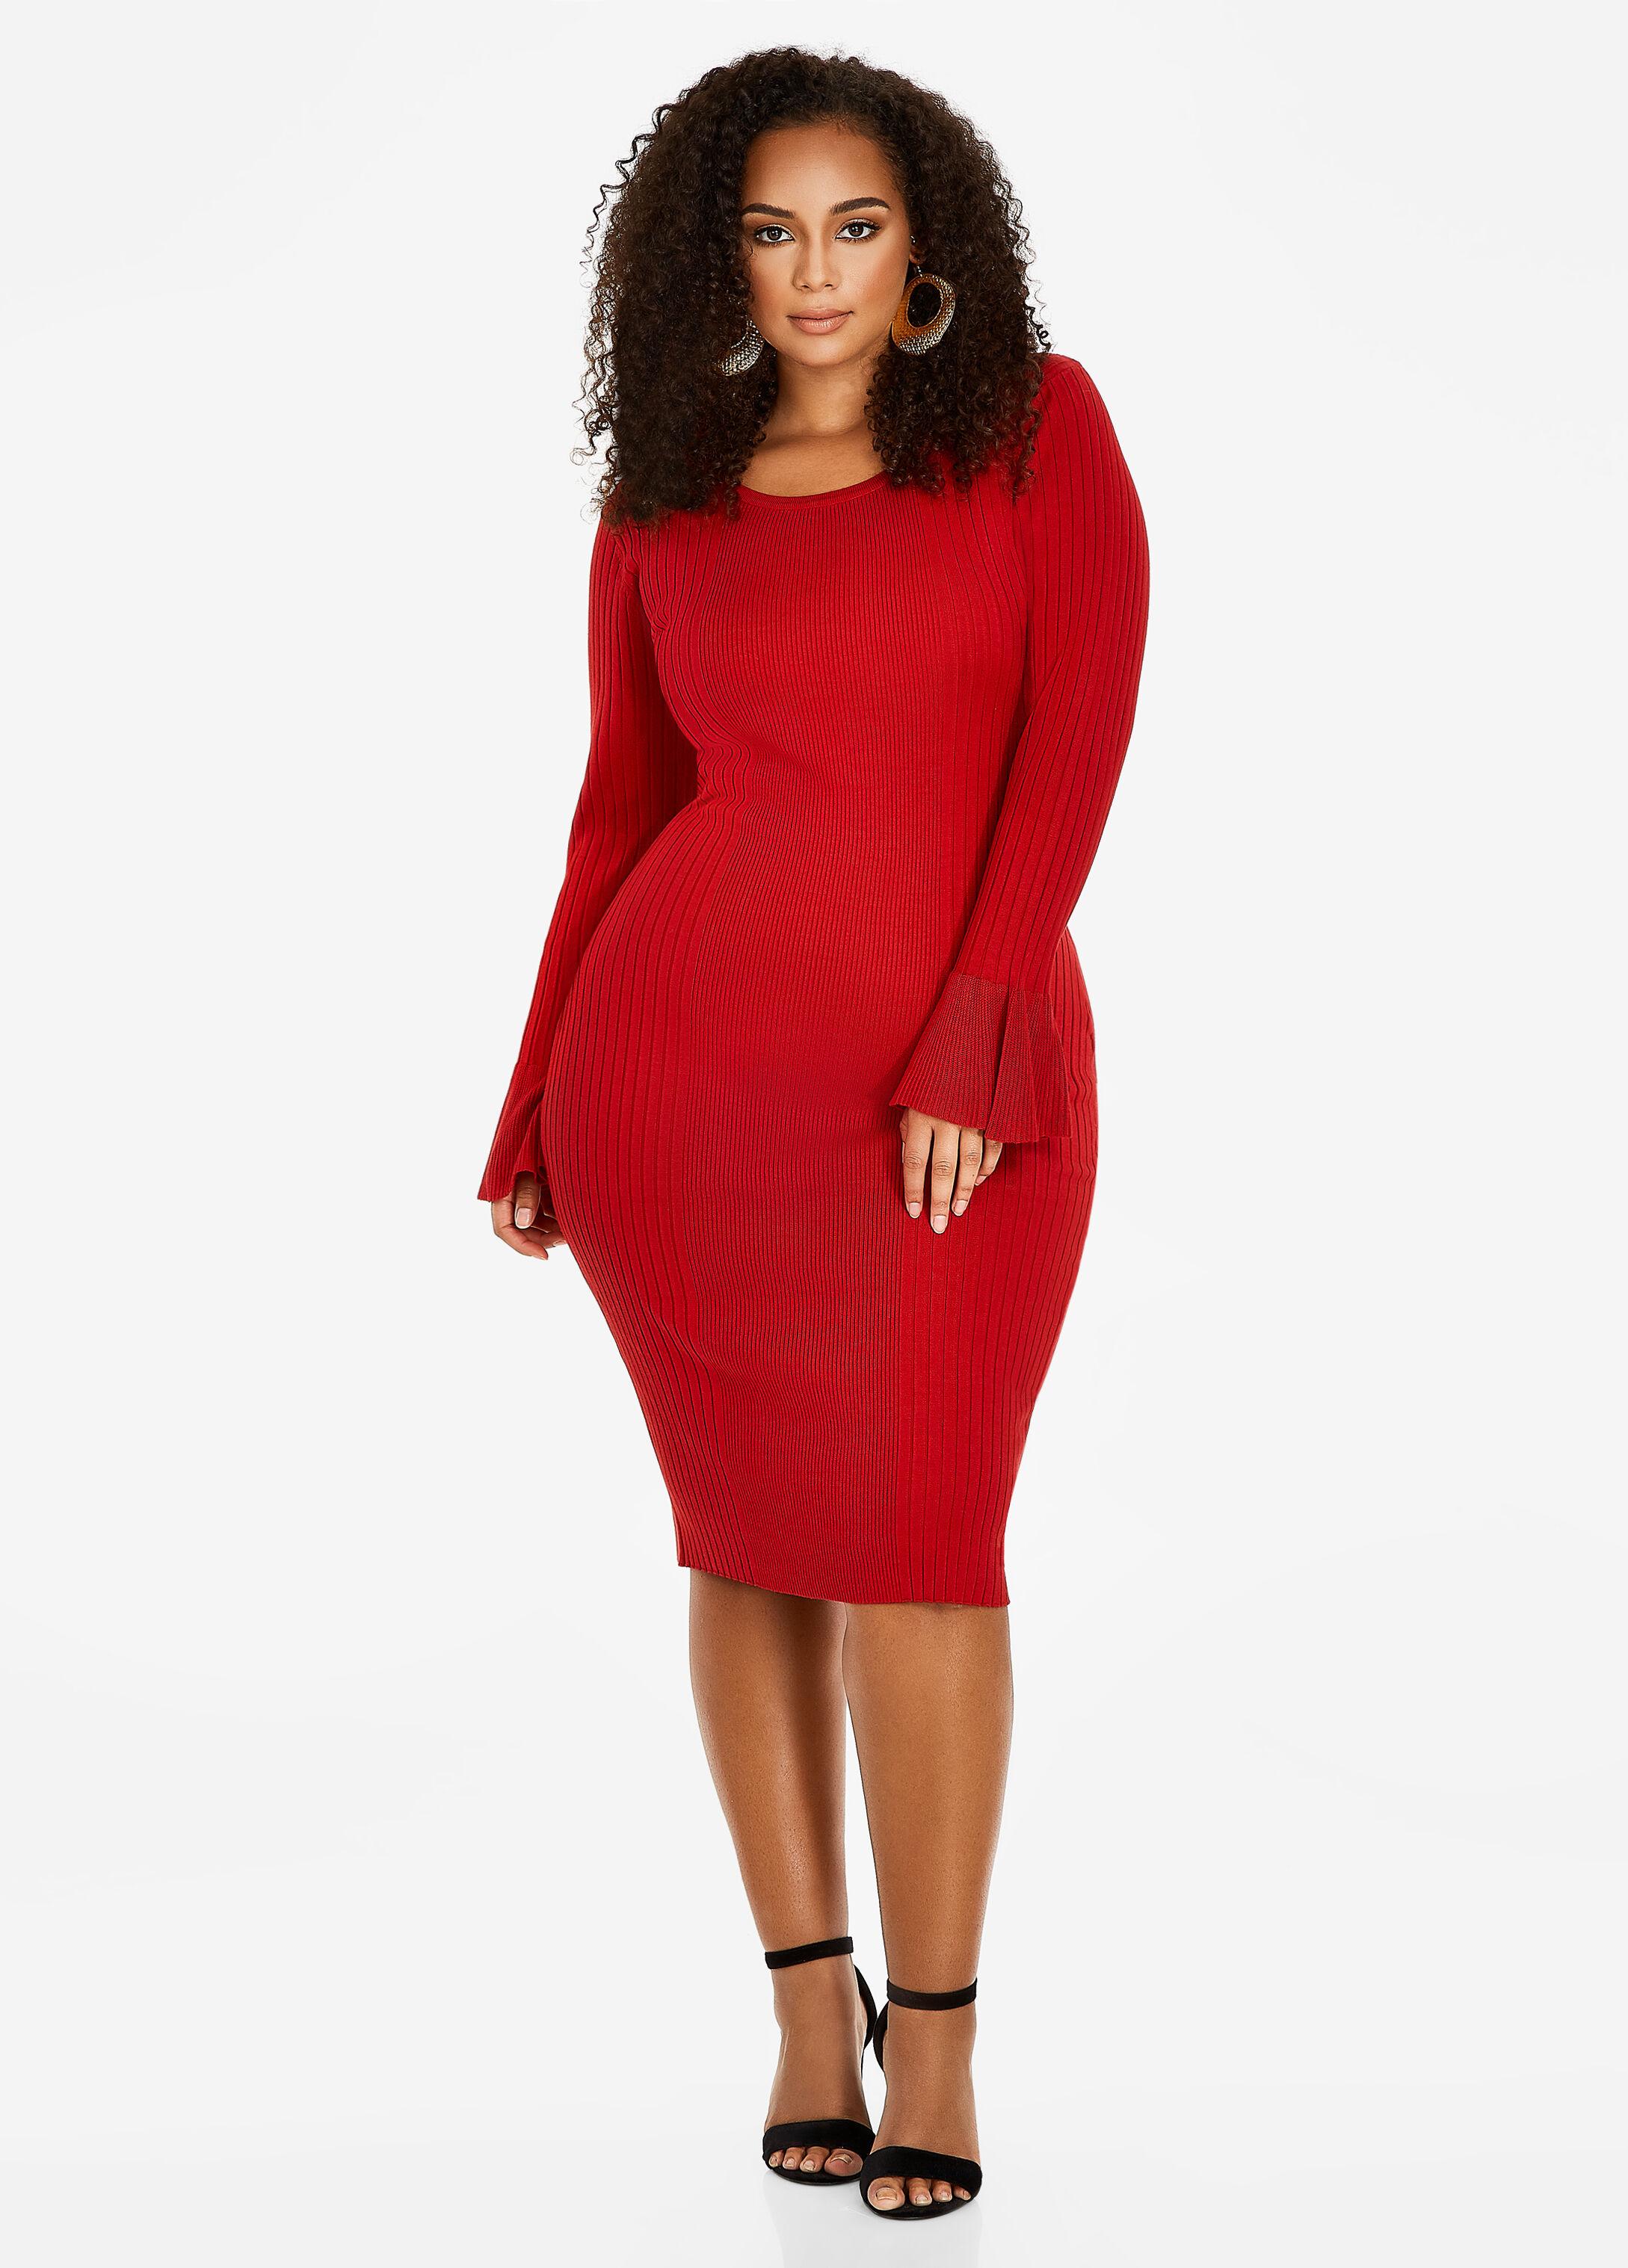 Plus Size Sweater Dress - Ruffle Sleeve Sweater Dress